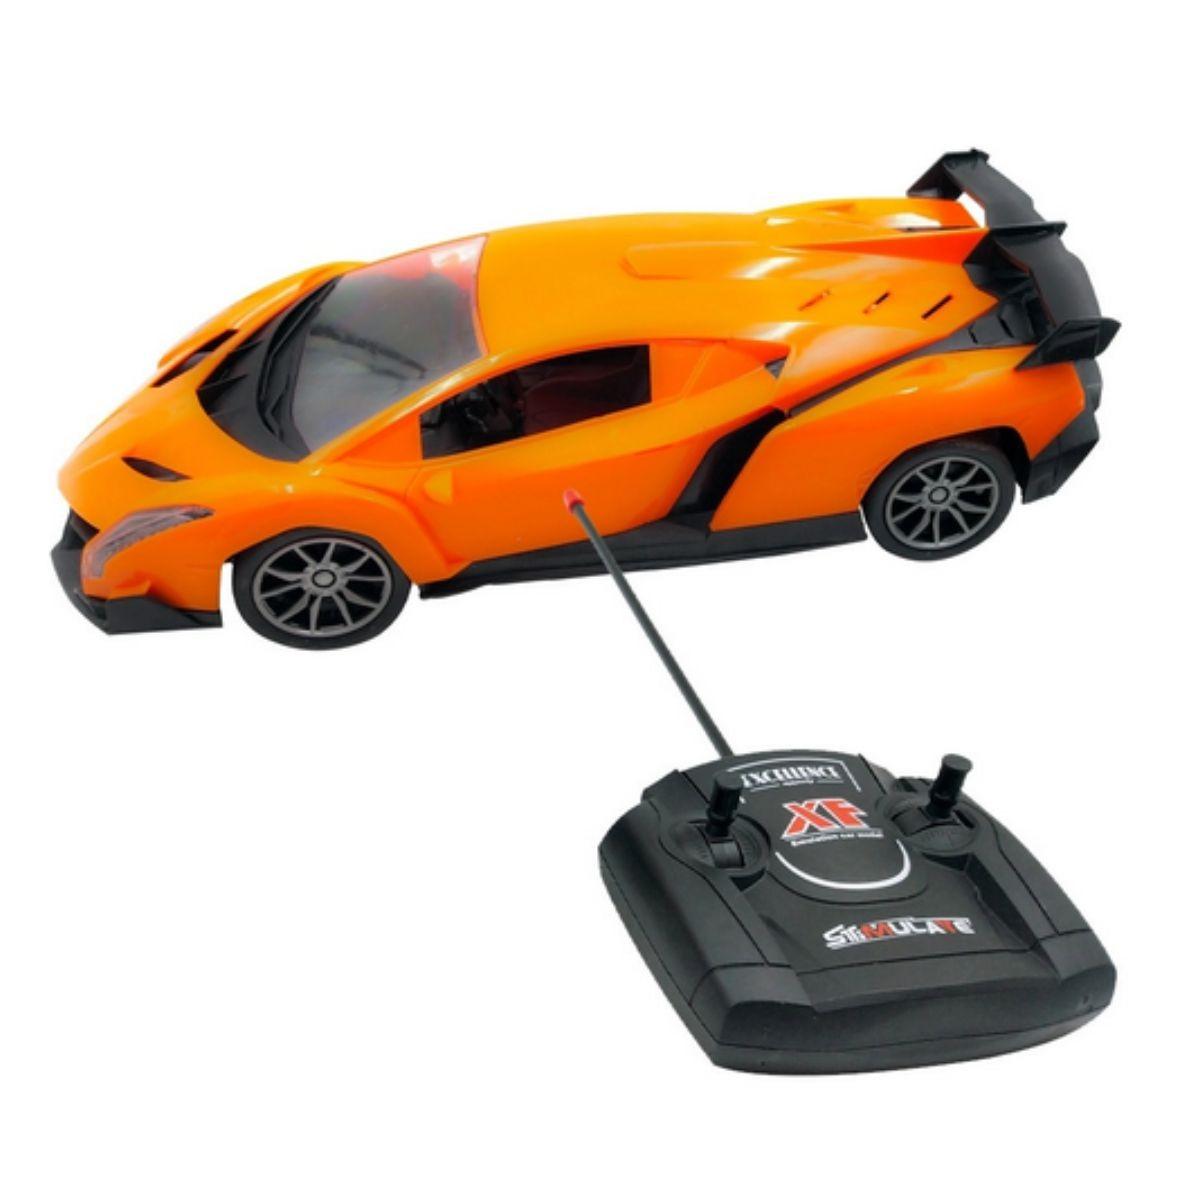 Carro de Controle Remoto - Racing Control Nitro - Multikids